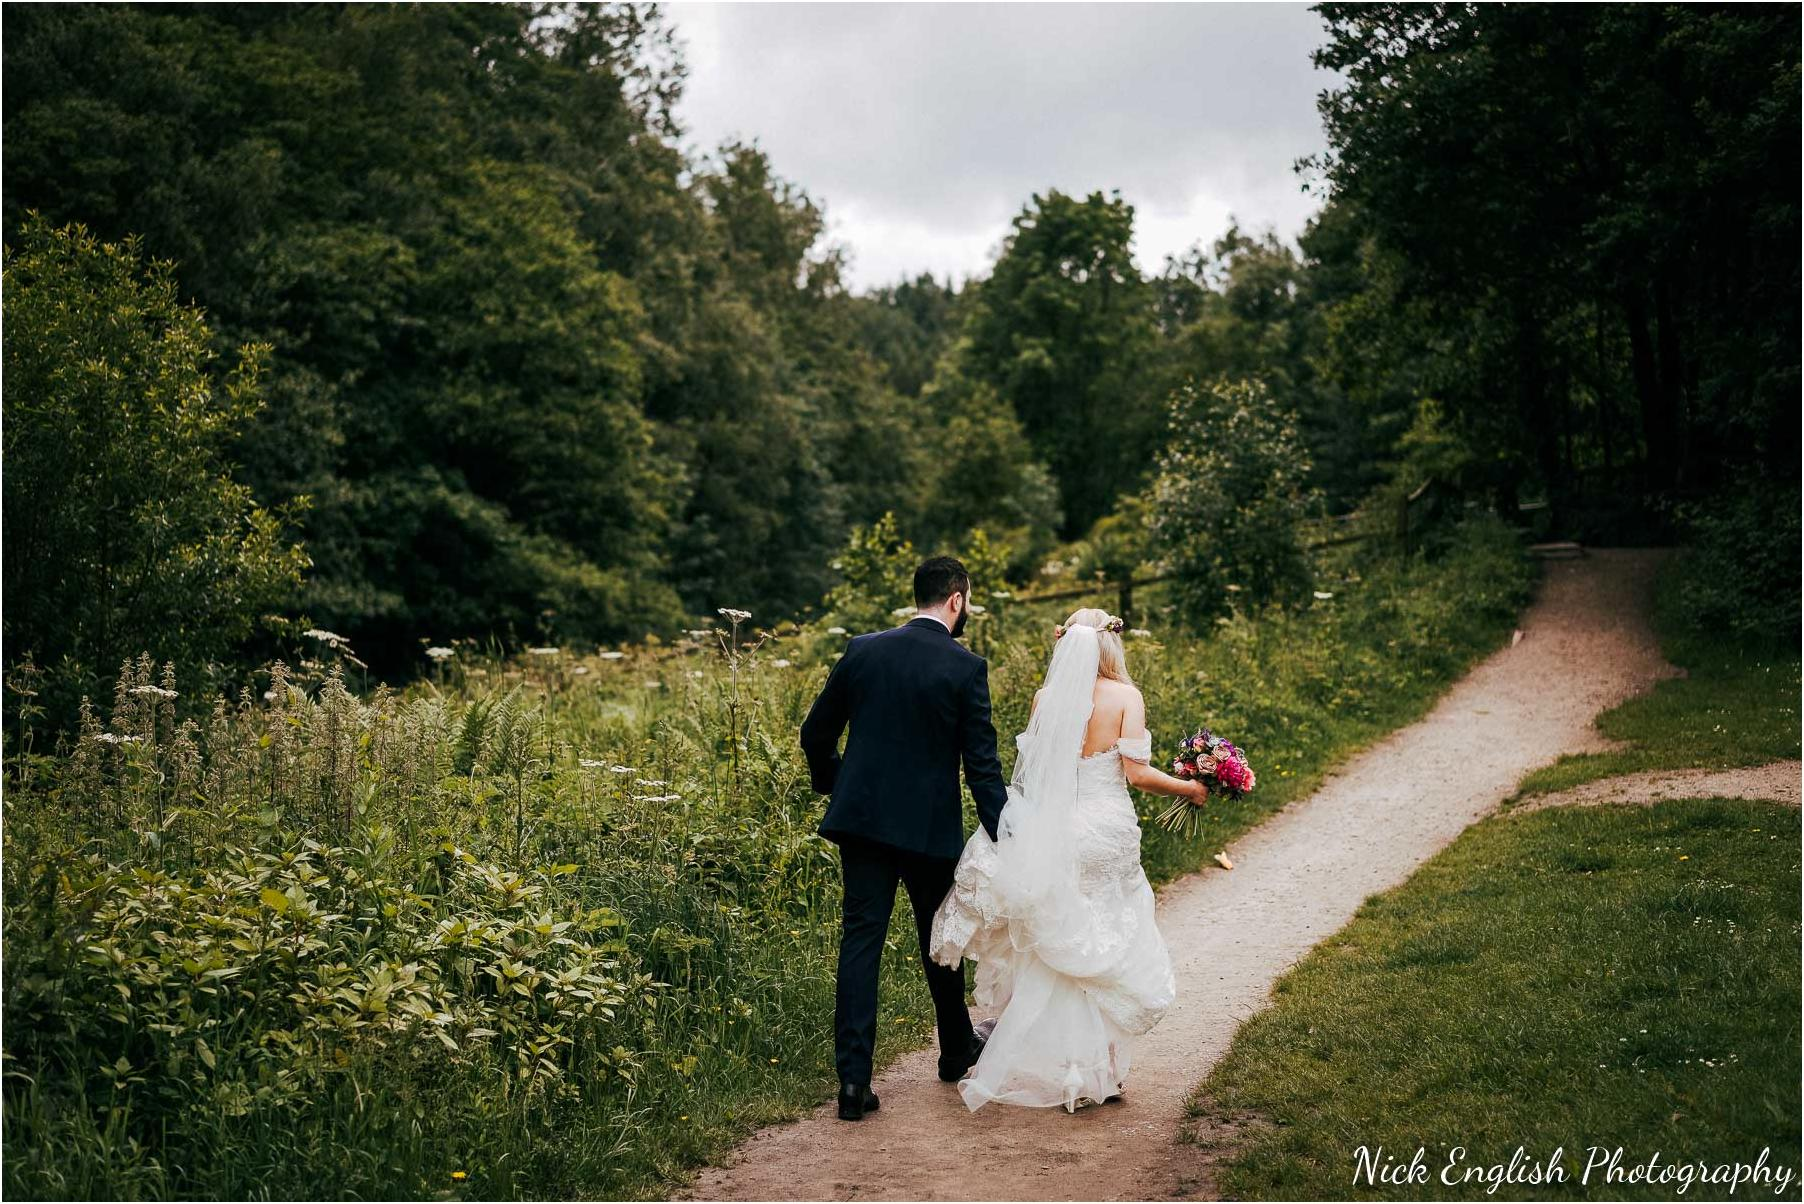 Whitebottom_Farm_Wedding_Manchester_Photograph-41.jpg